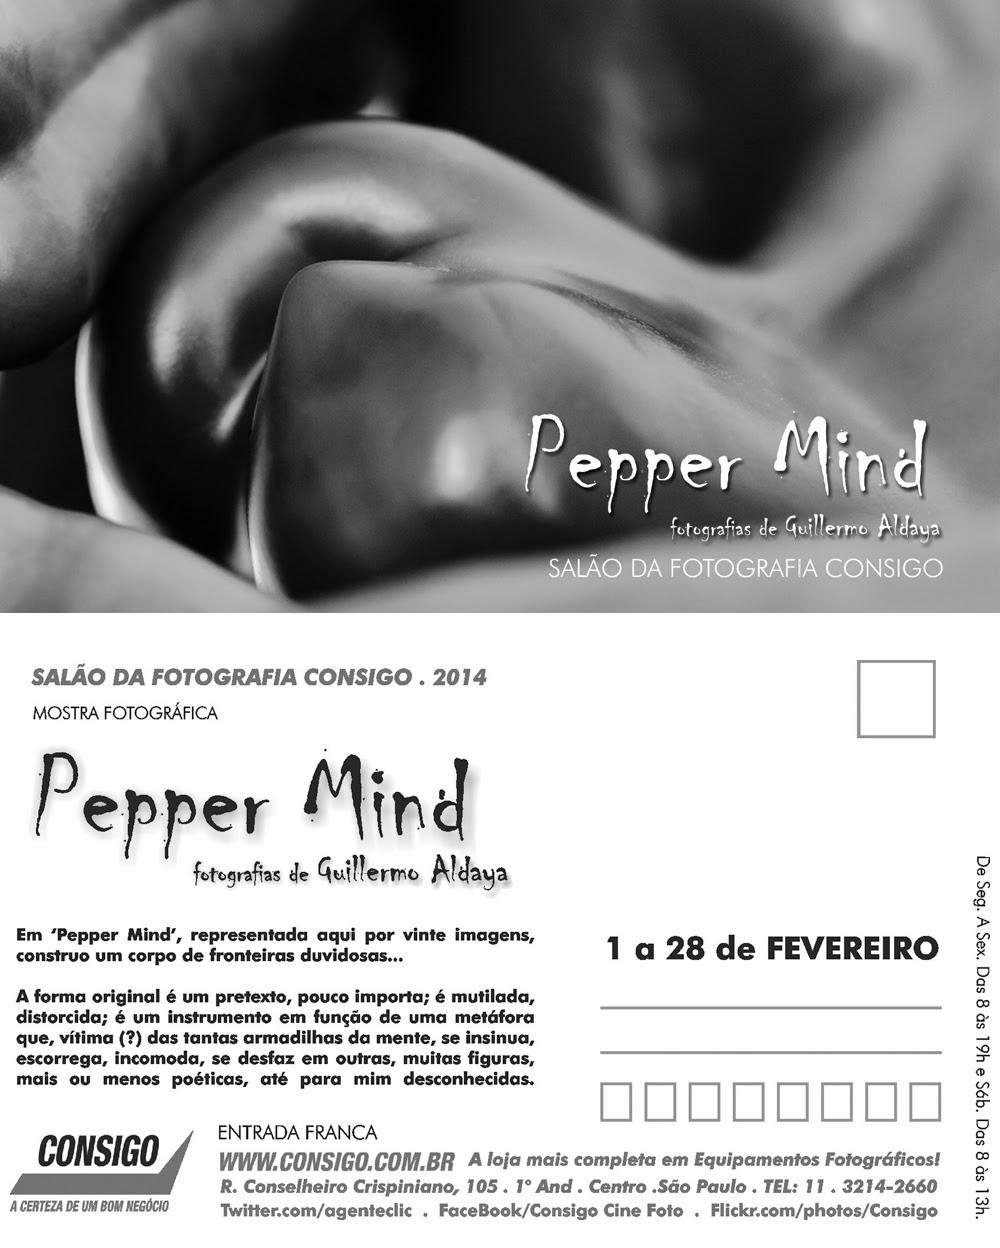 Pepper Mind, by Guillermo Aldaya / PhotoConversa